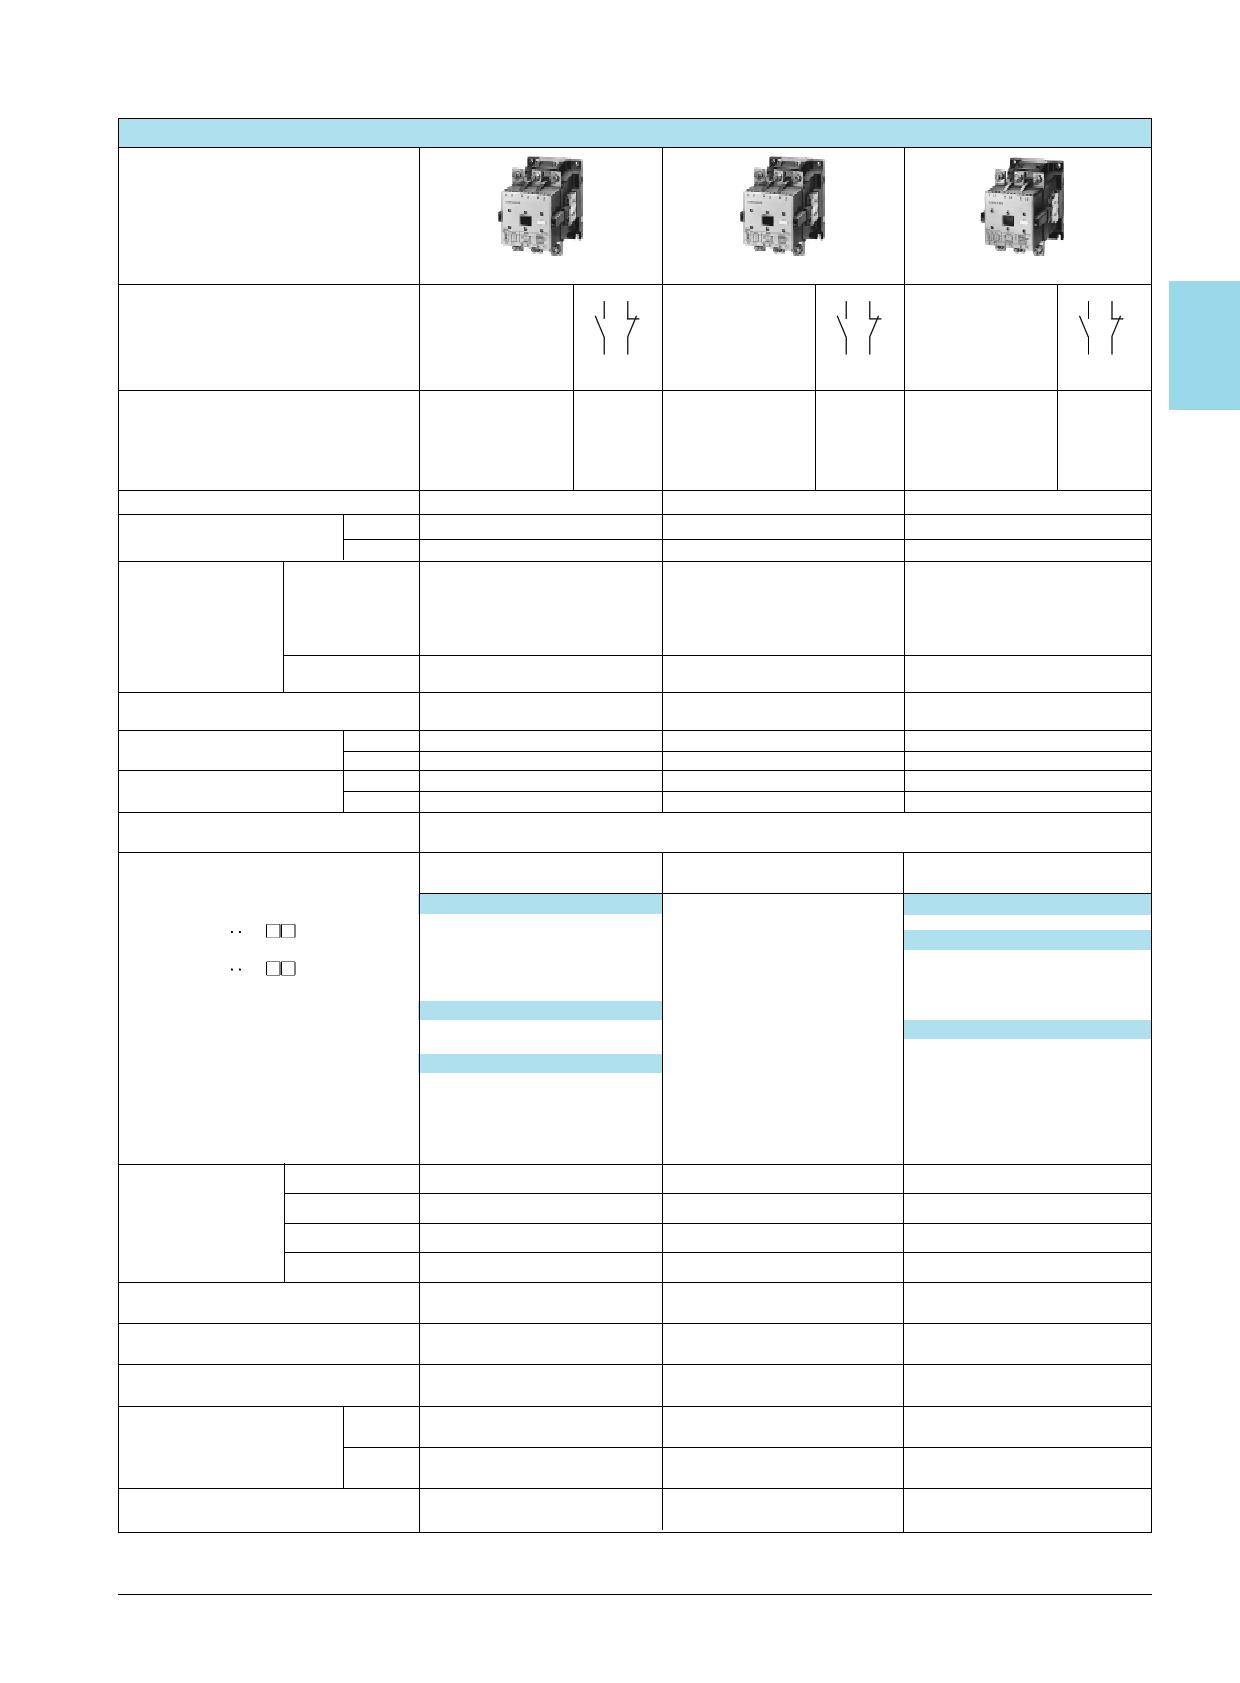 3TF34 Datasheet, Funktion